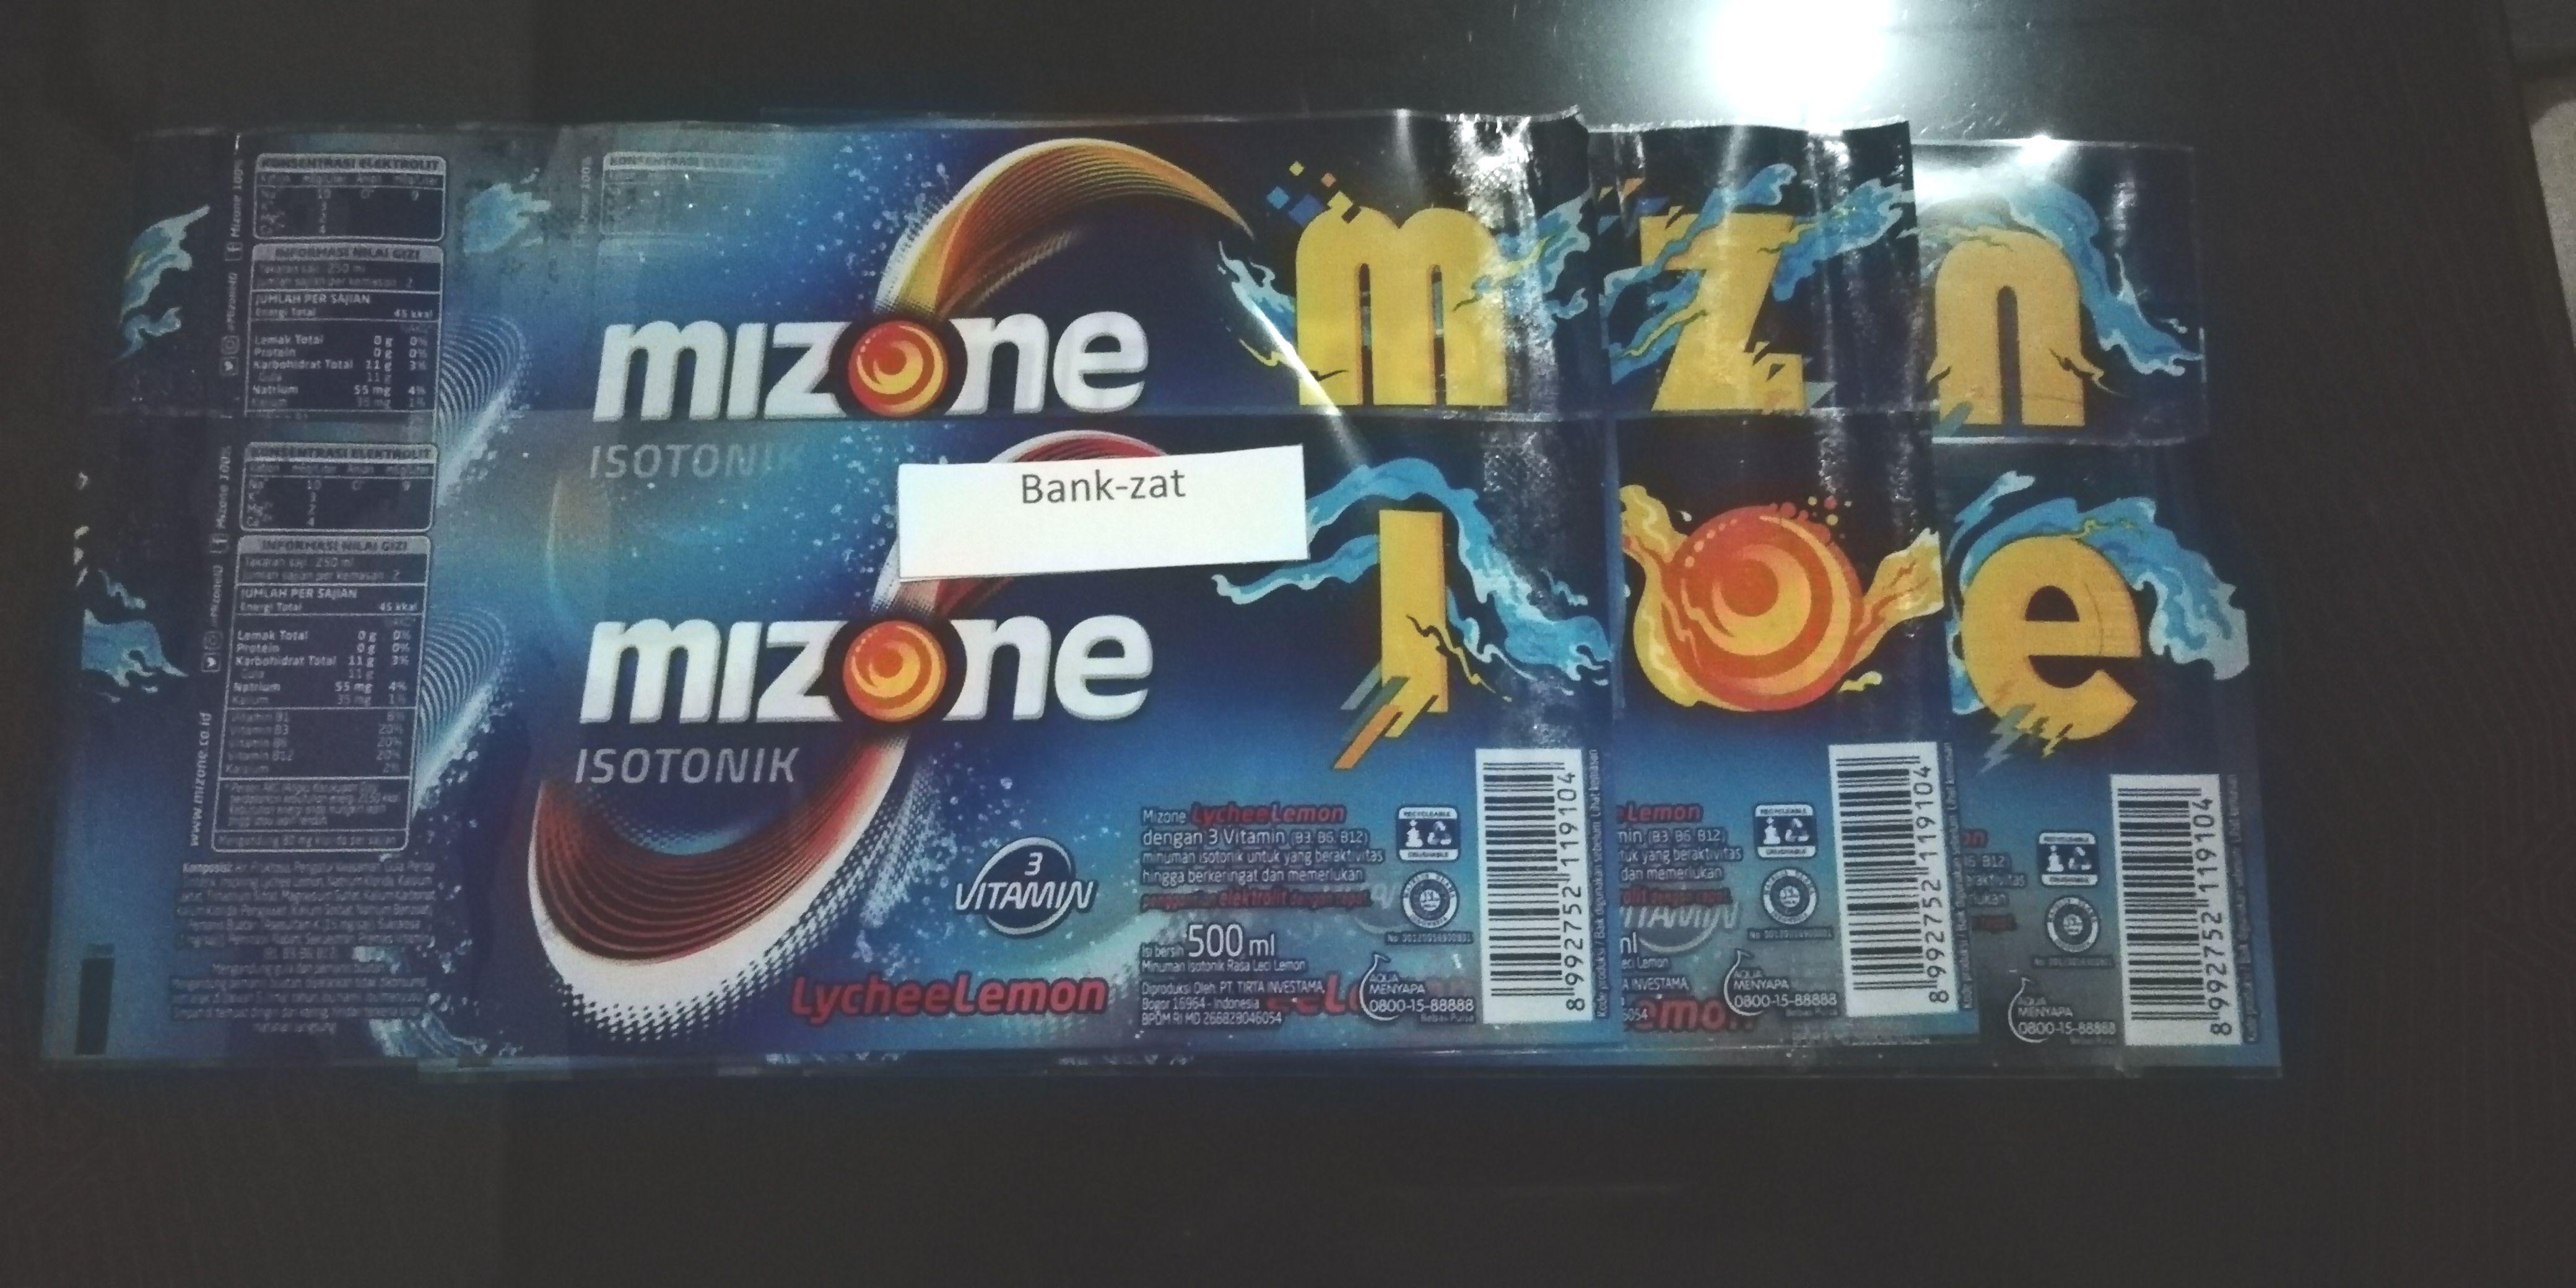 fun with mizone #KASKUSxMizone